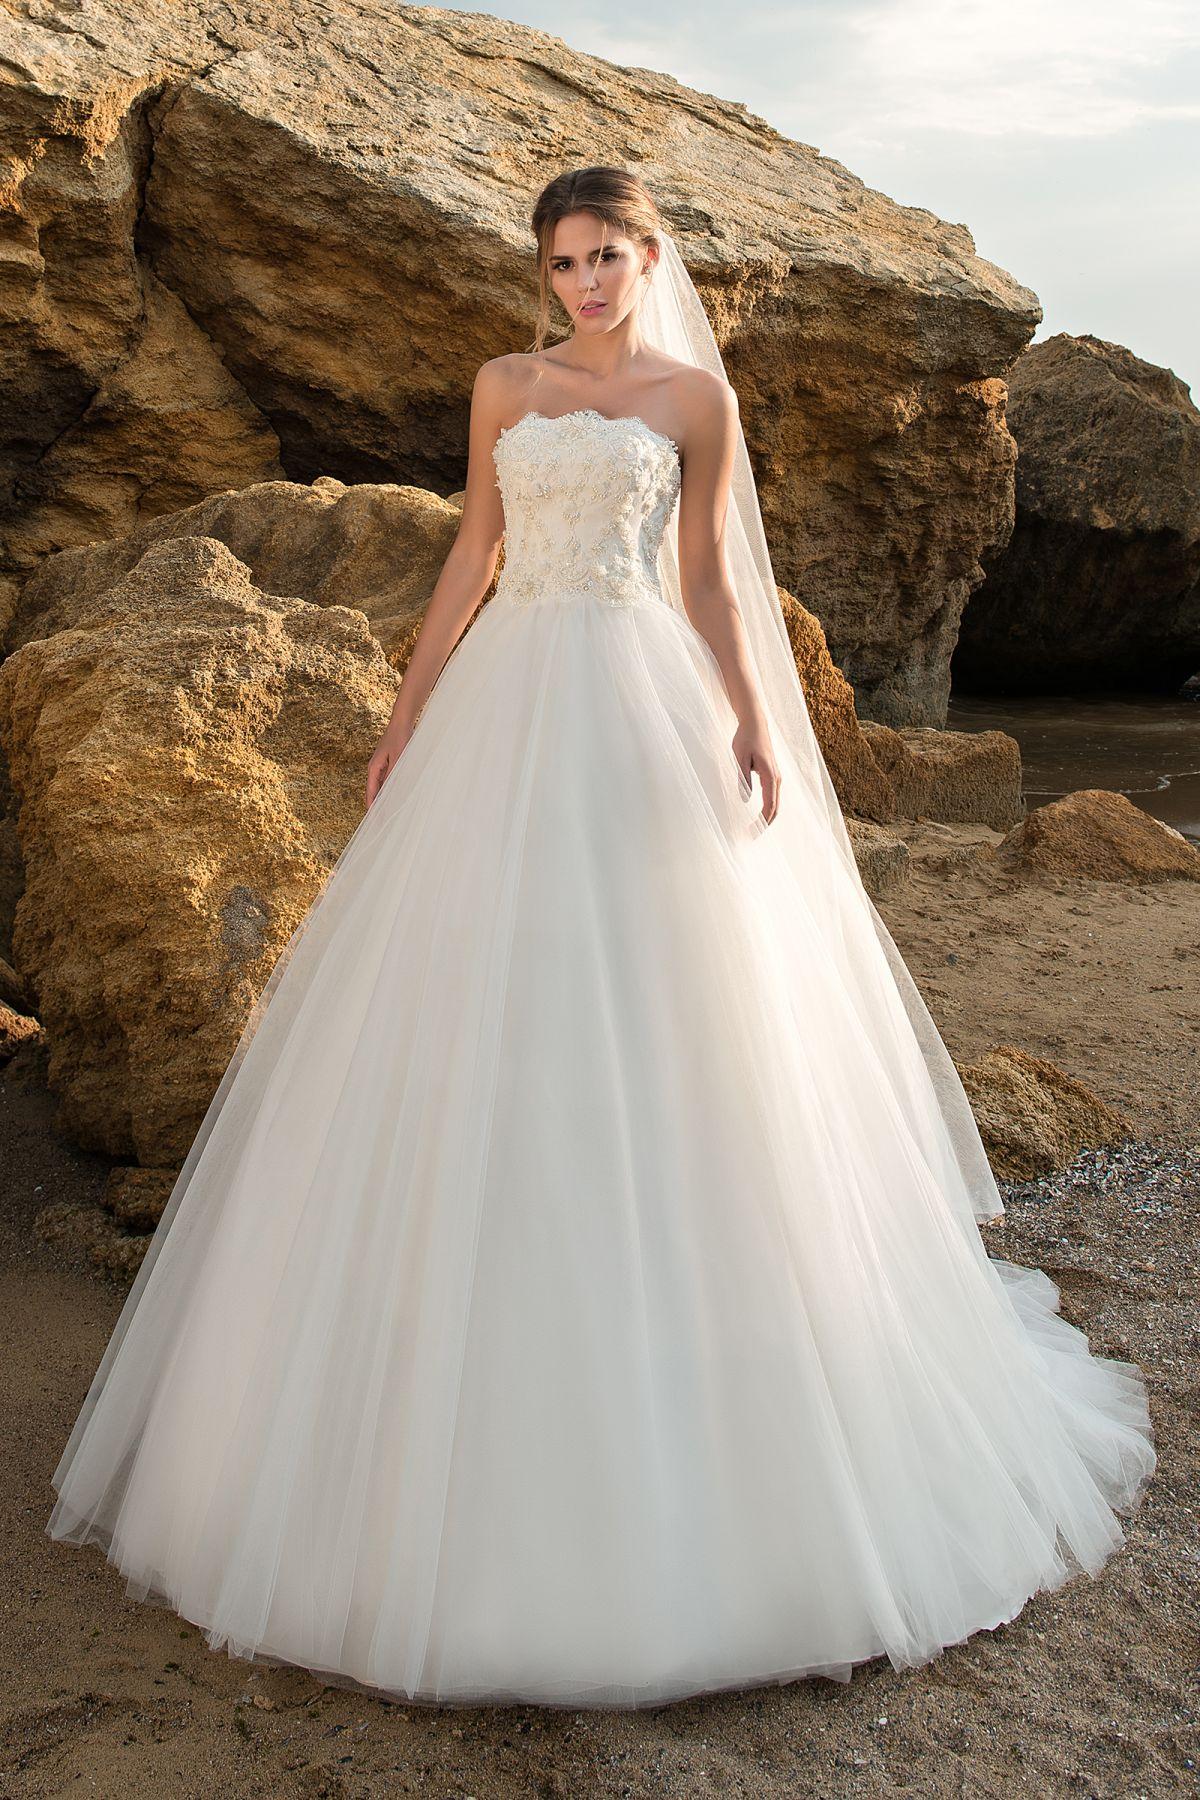 9ebdf6d75959 Νυφικό «Zina» - Νυφικά Θρησκευτικού Γάμου